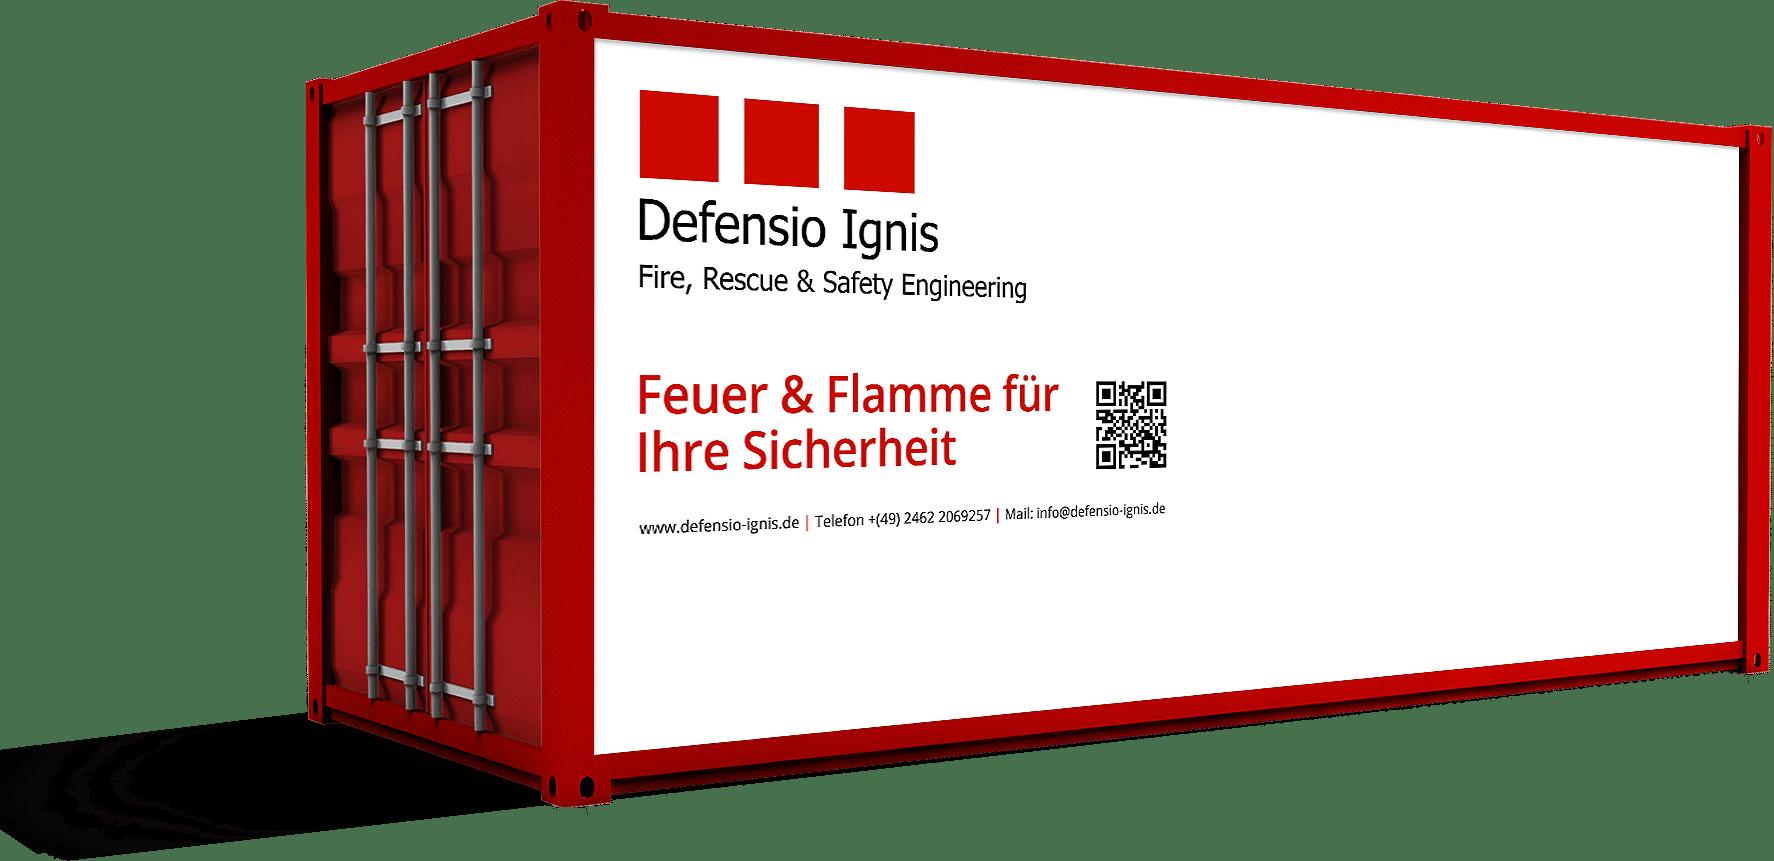 Defensio Ignis Brandschutzcontainer